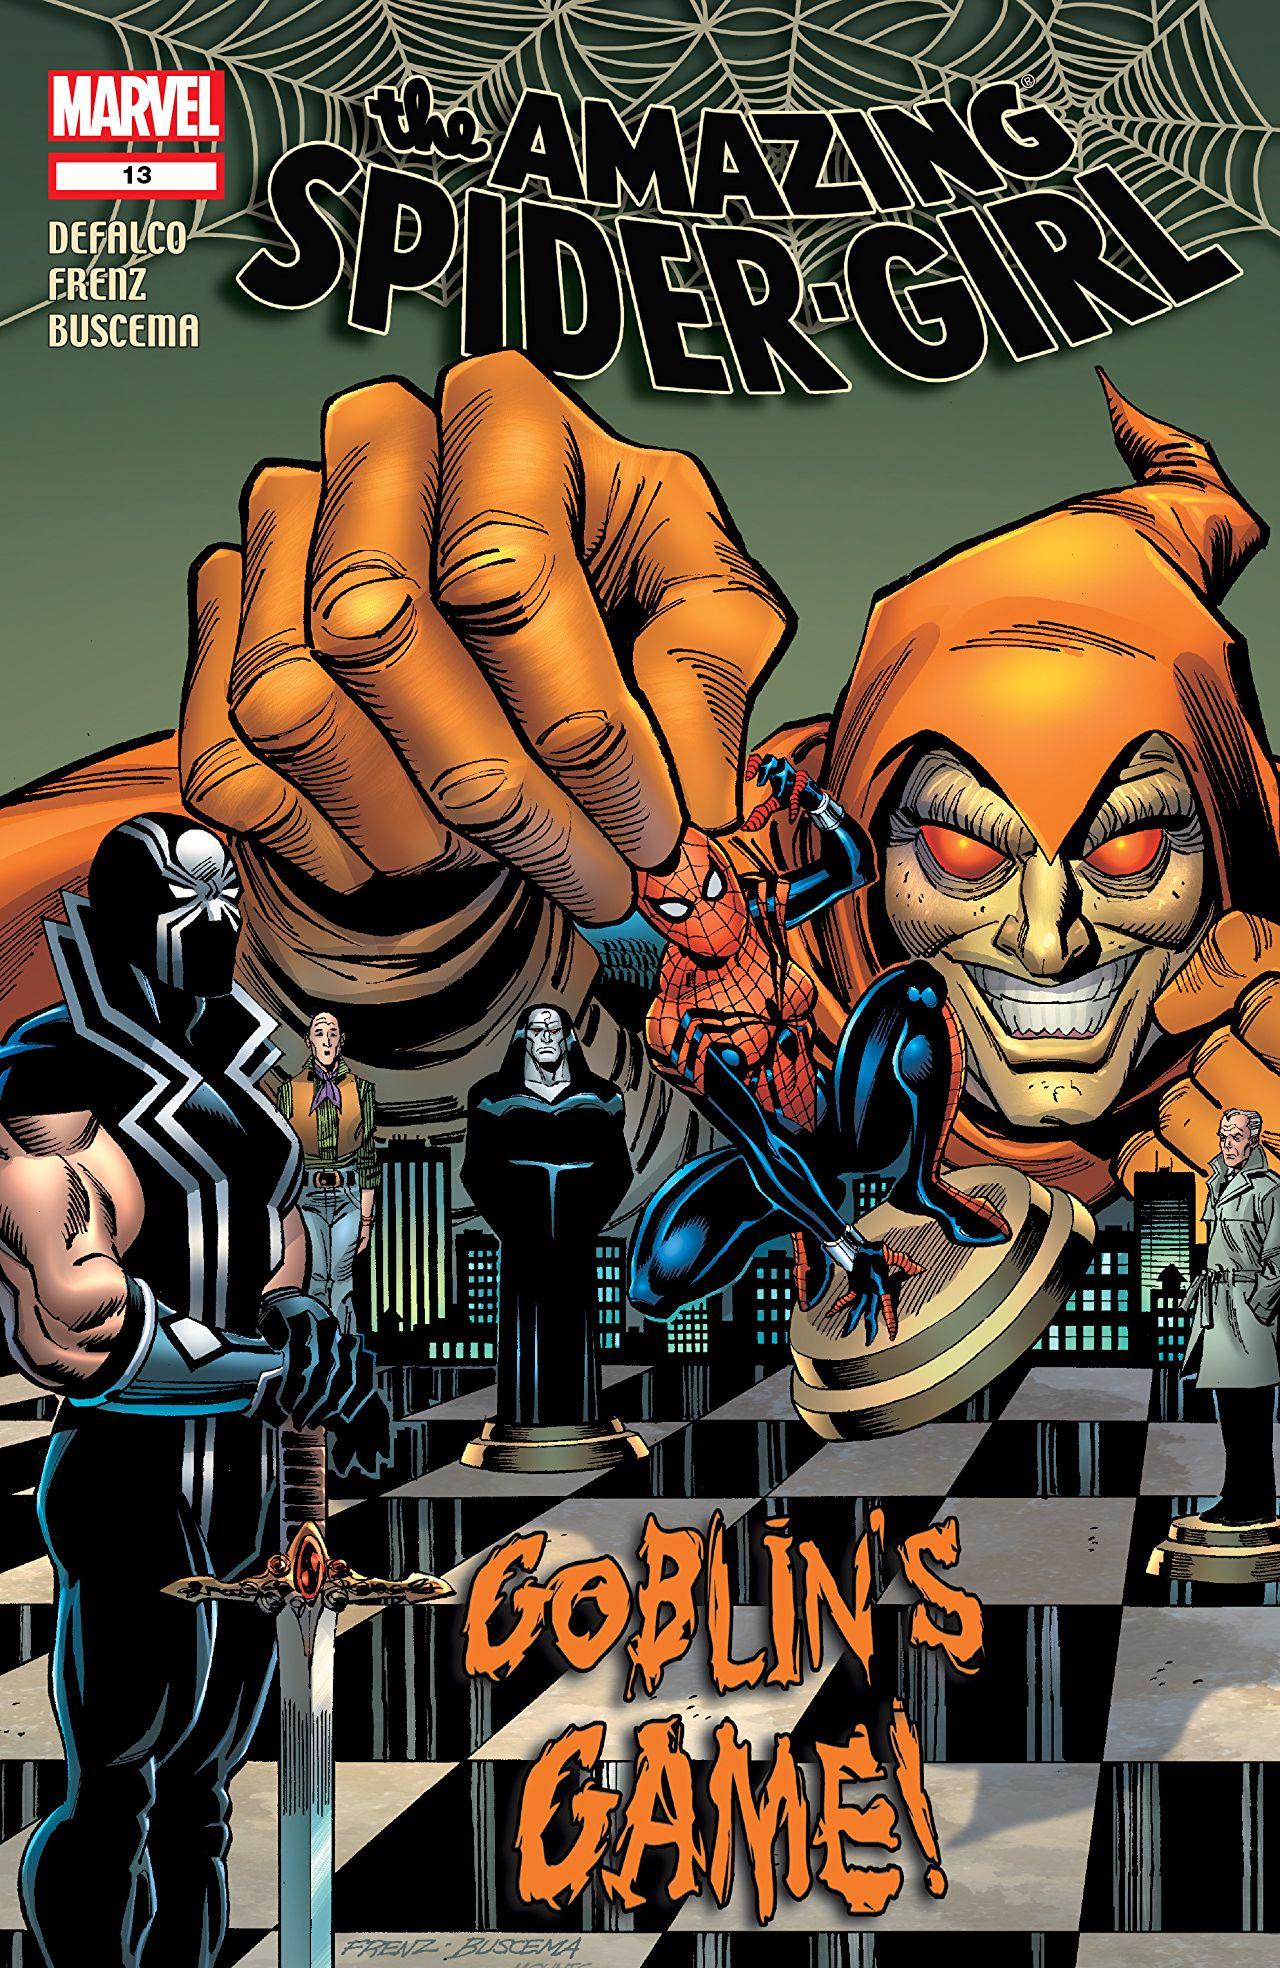 Amazing Spider-Girl Vol 1 13